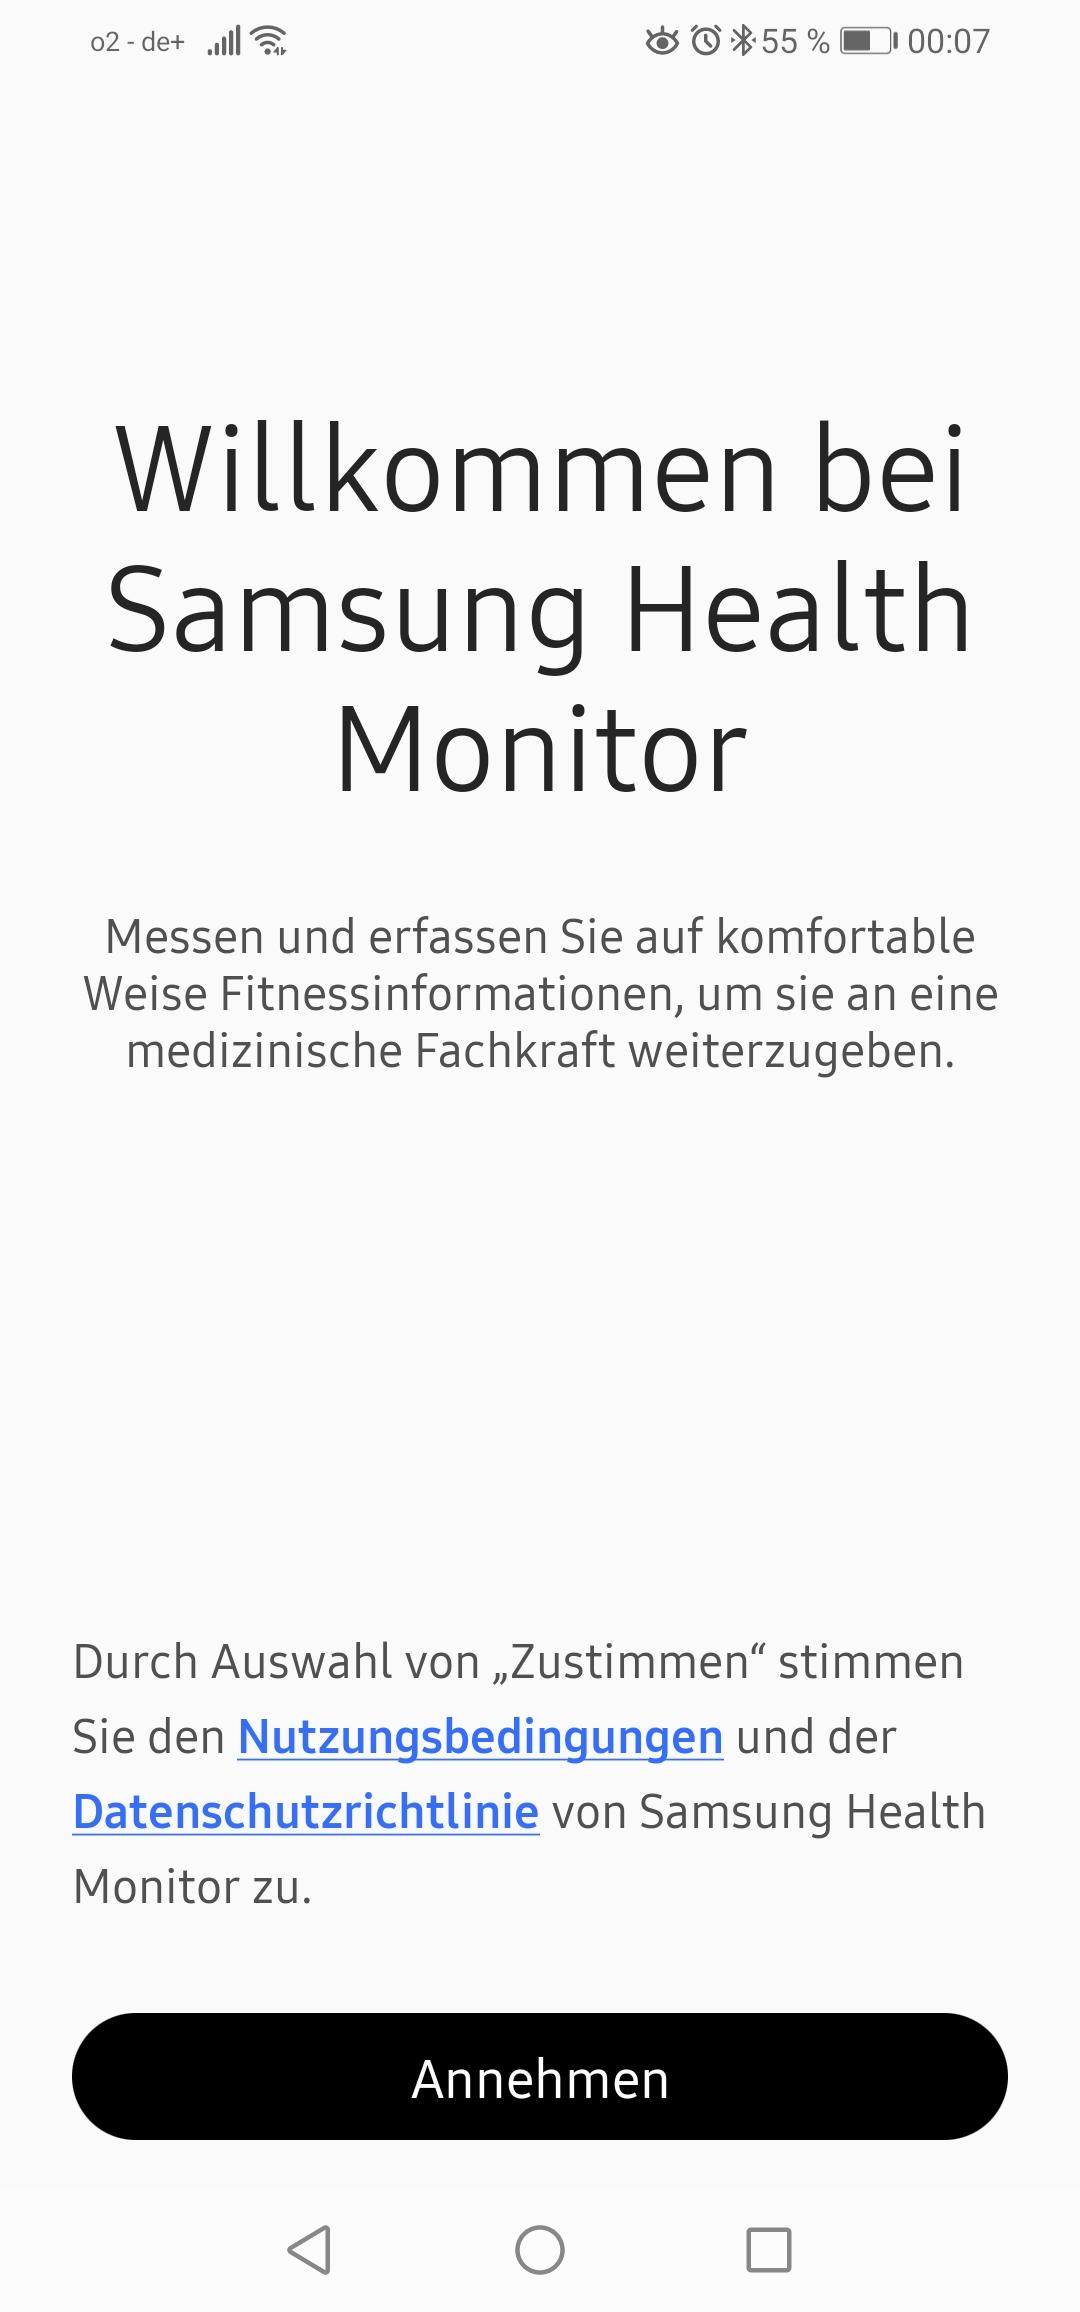 Screenshot_20210915_000711_com.samsung.android.shealthmonitor.jpg